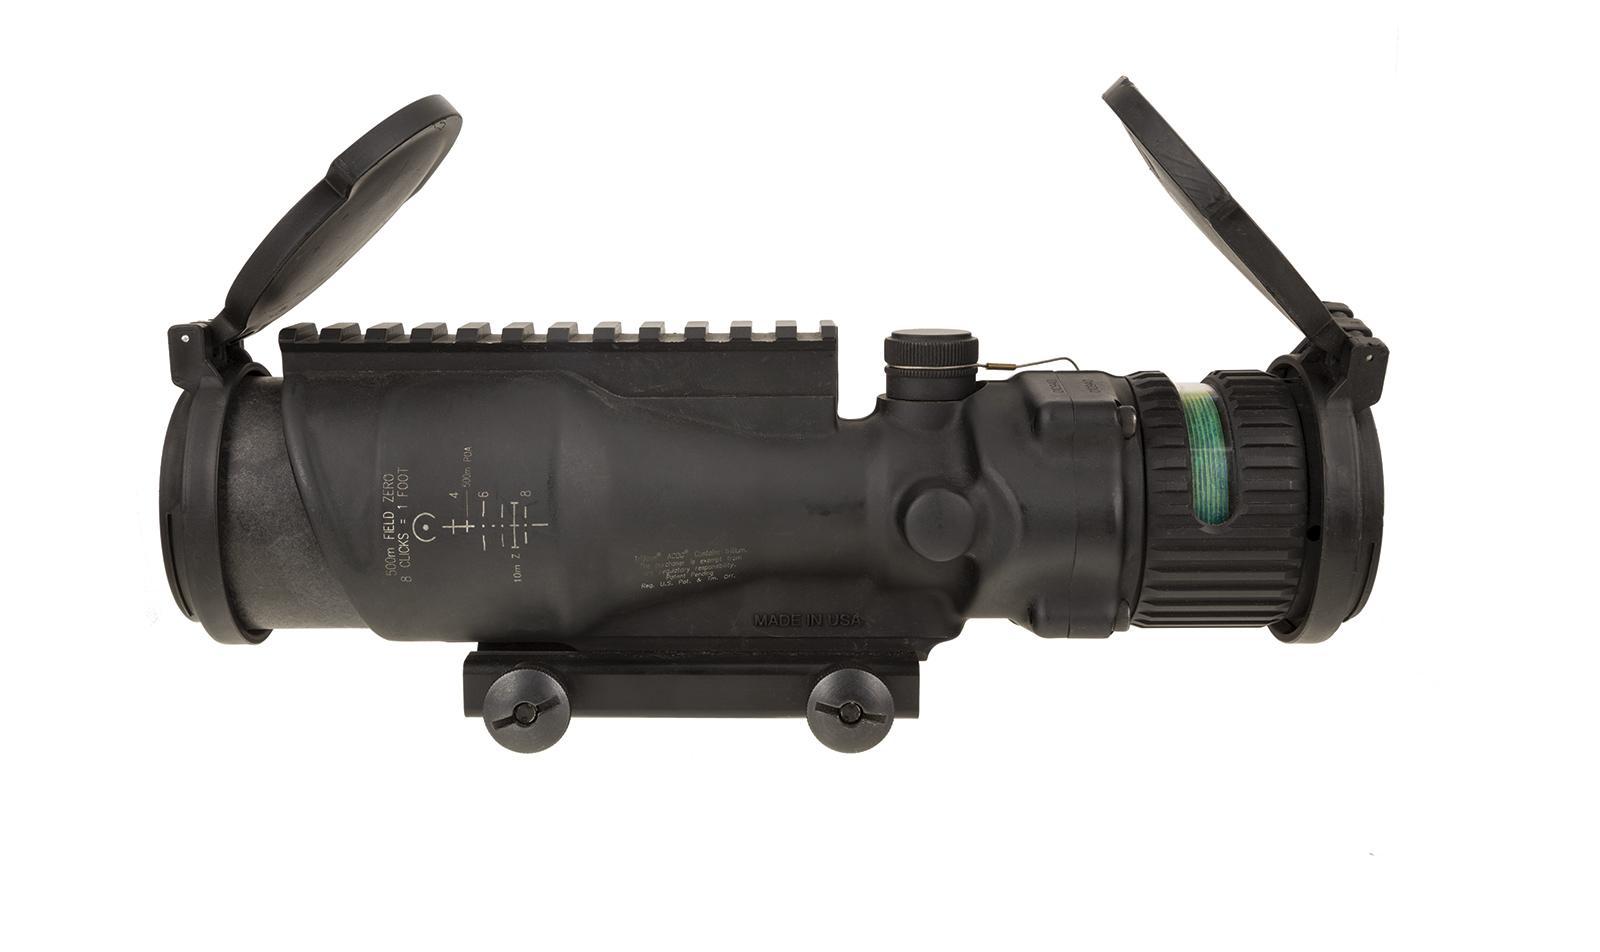 TA648MGO-M240 angle 2